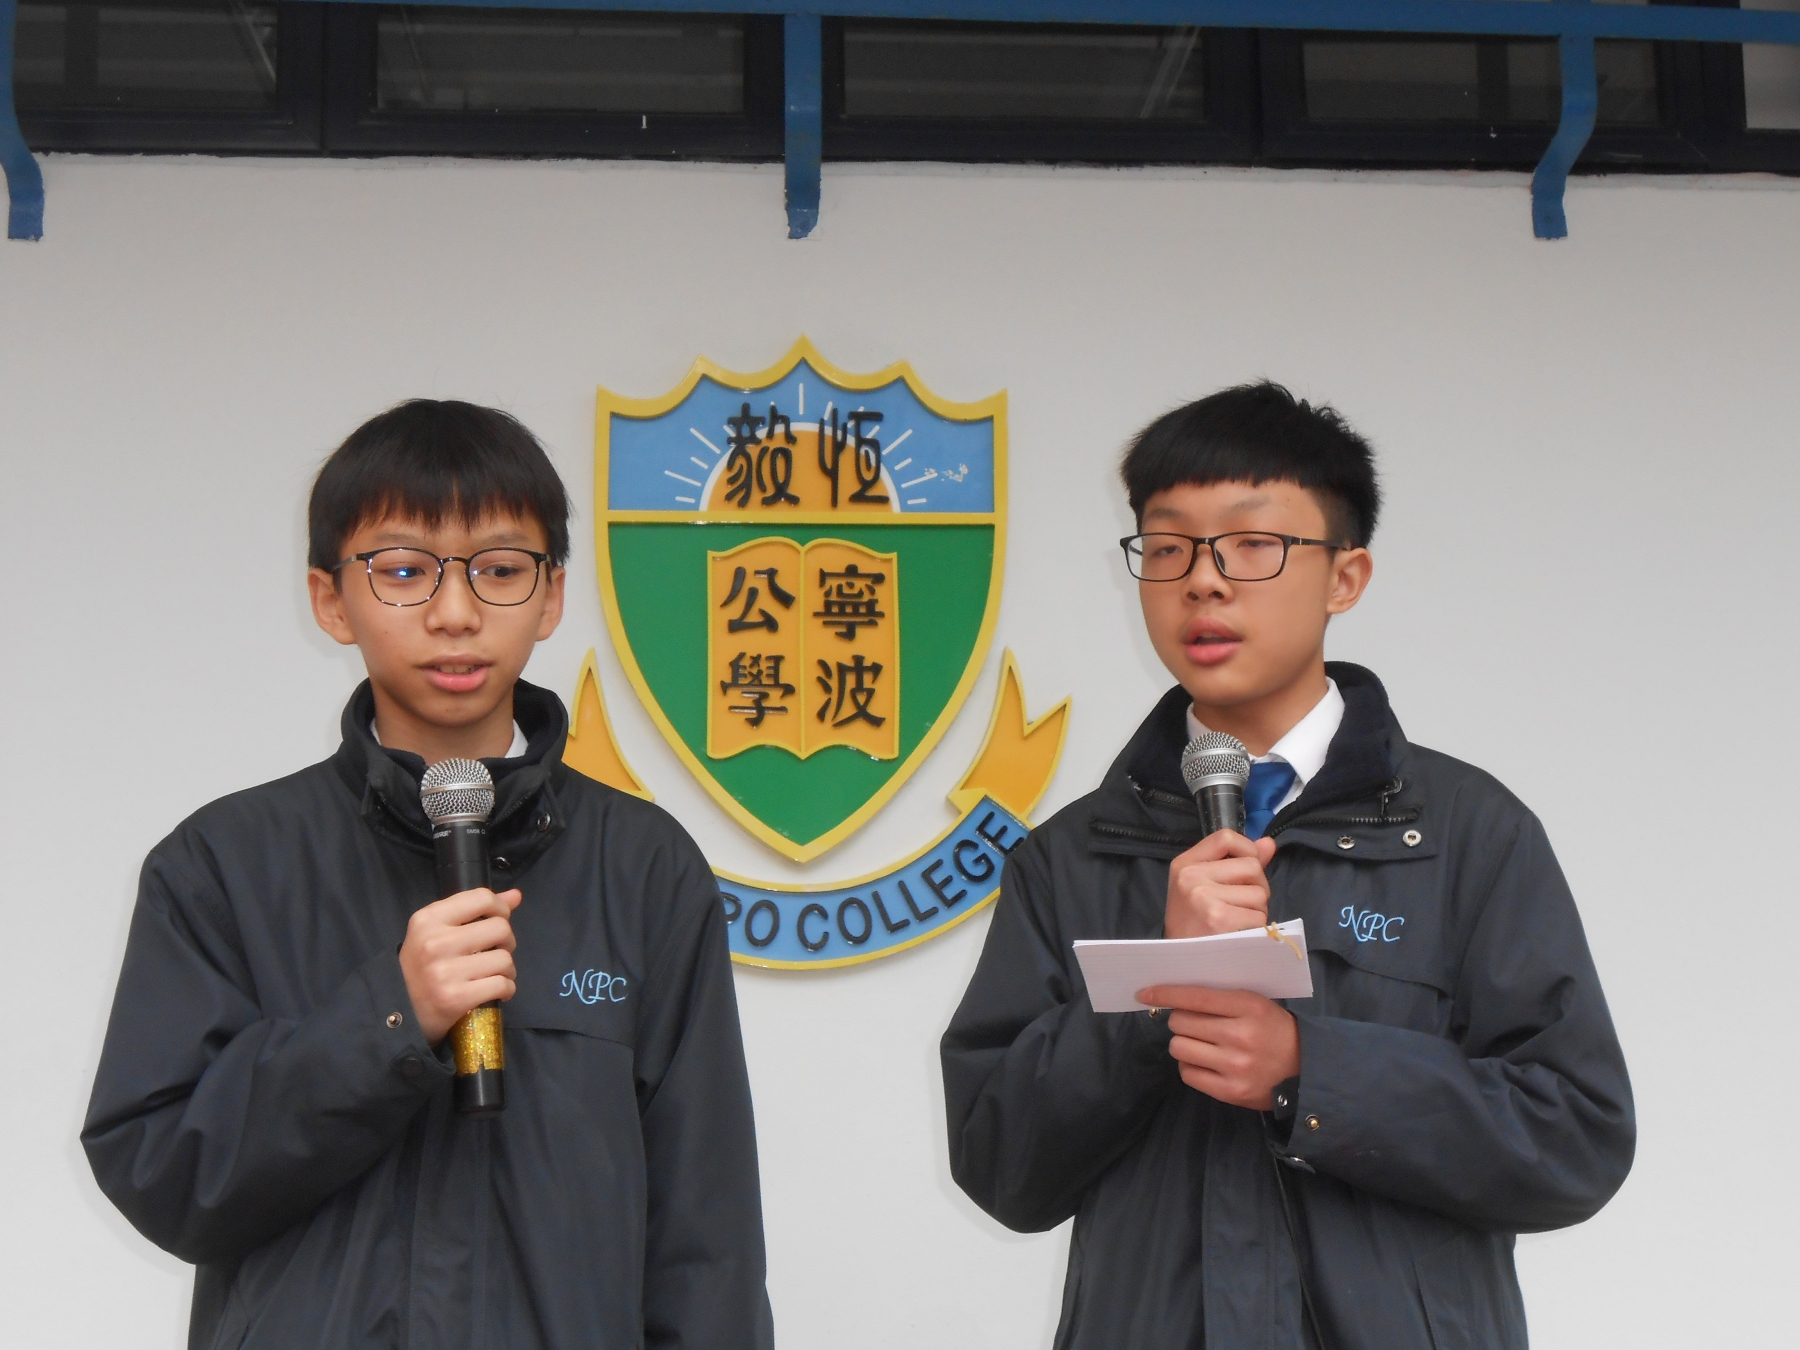 http://npc.edu.hk/sites/default/files/dscn2116.jpg